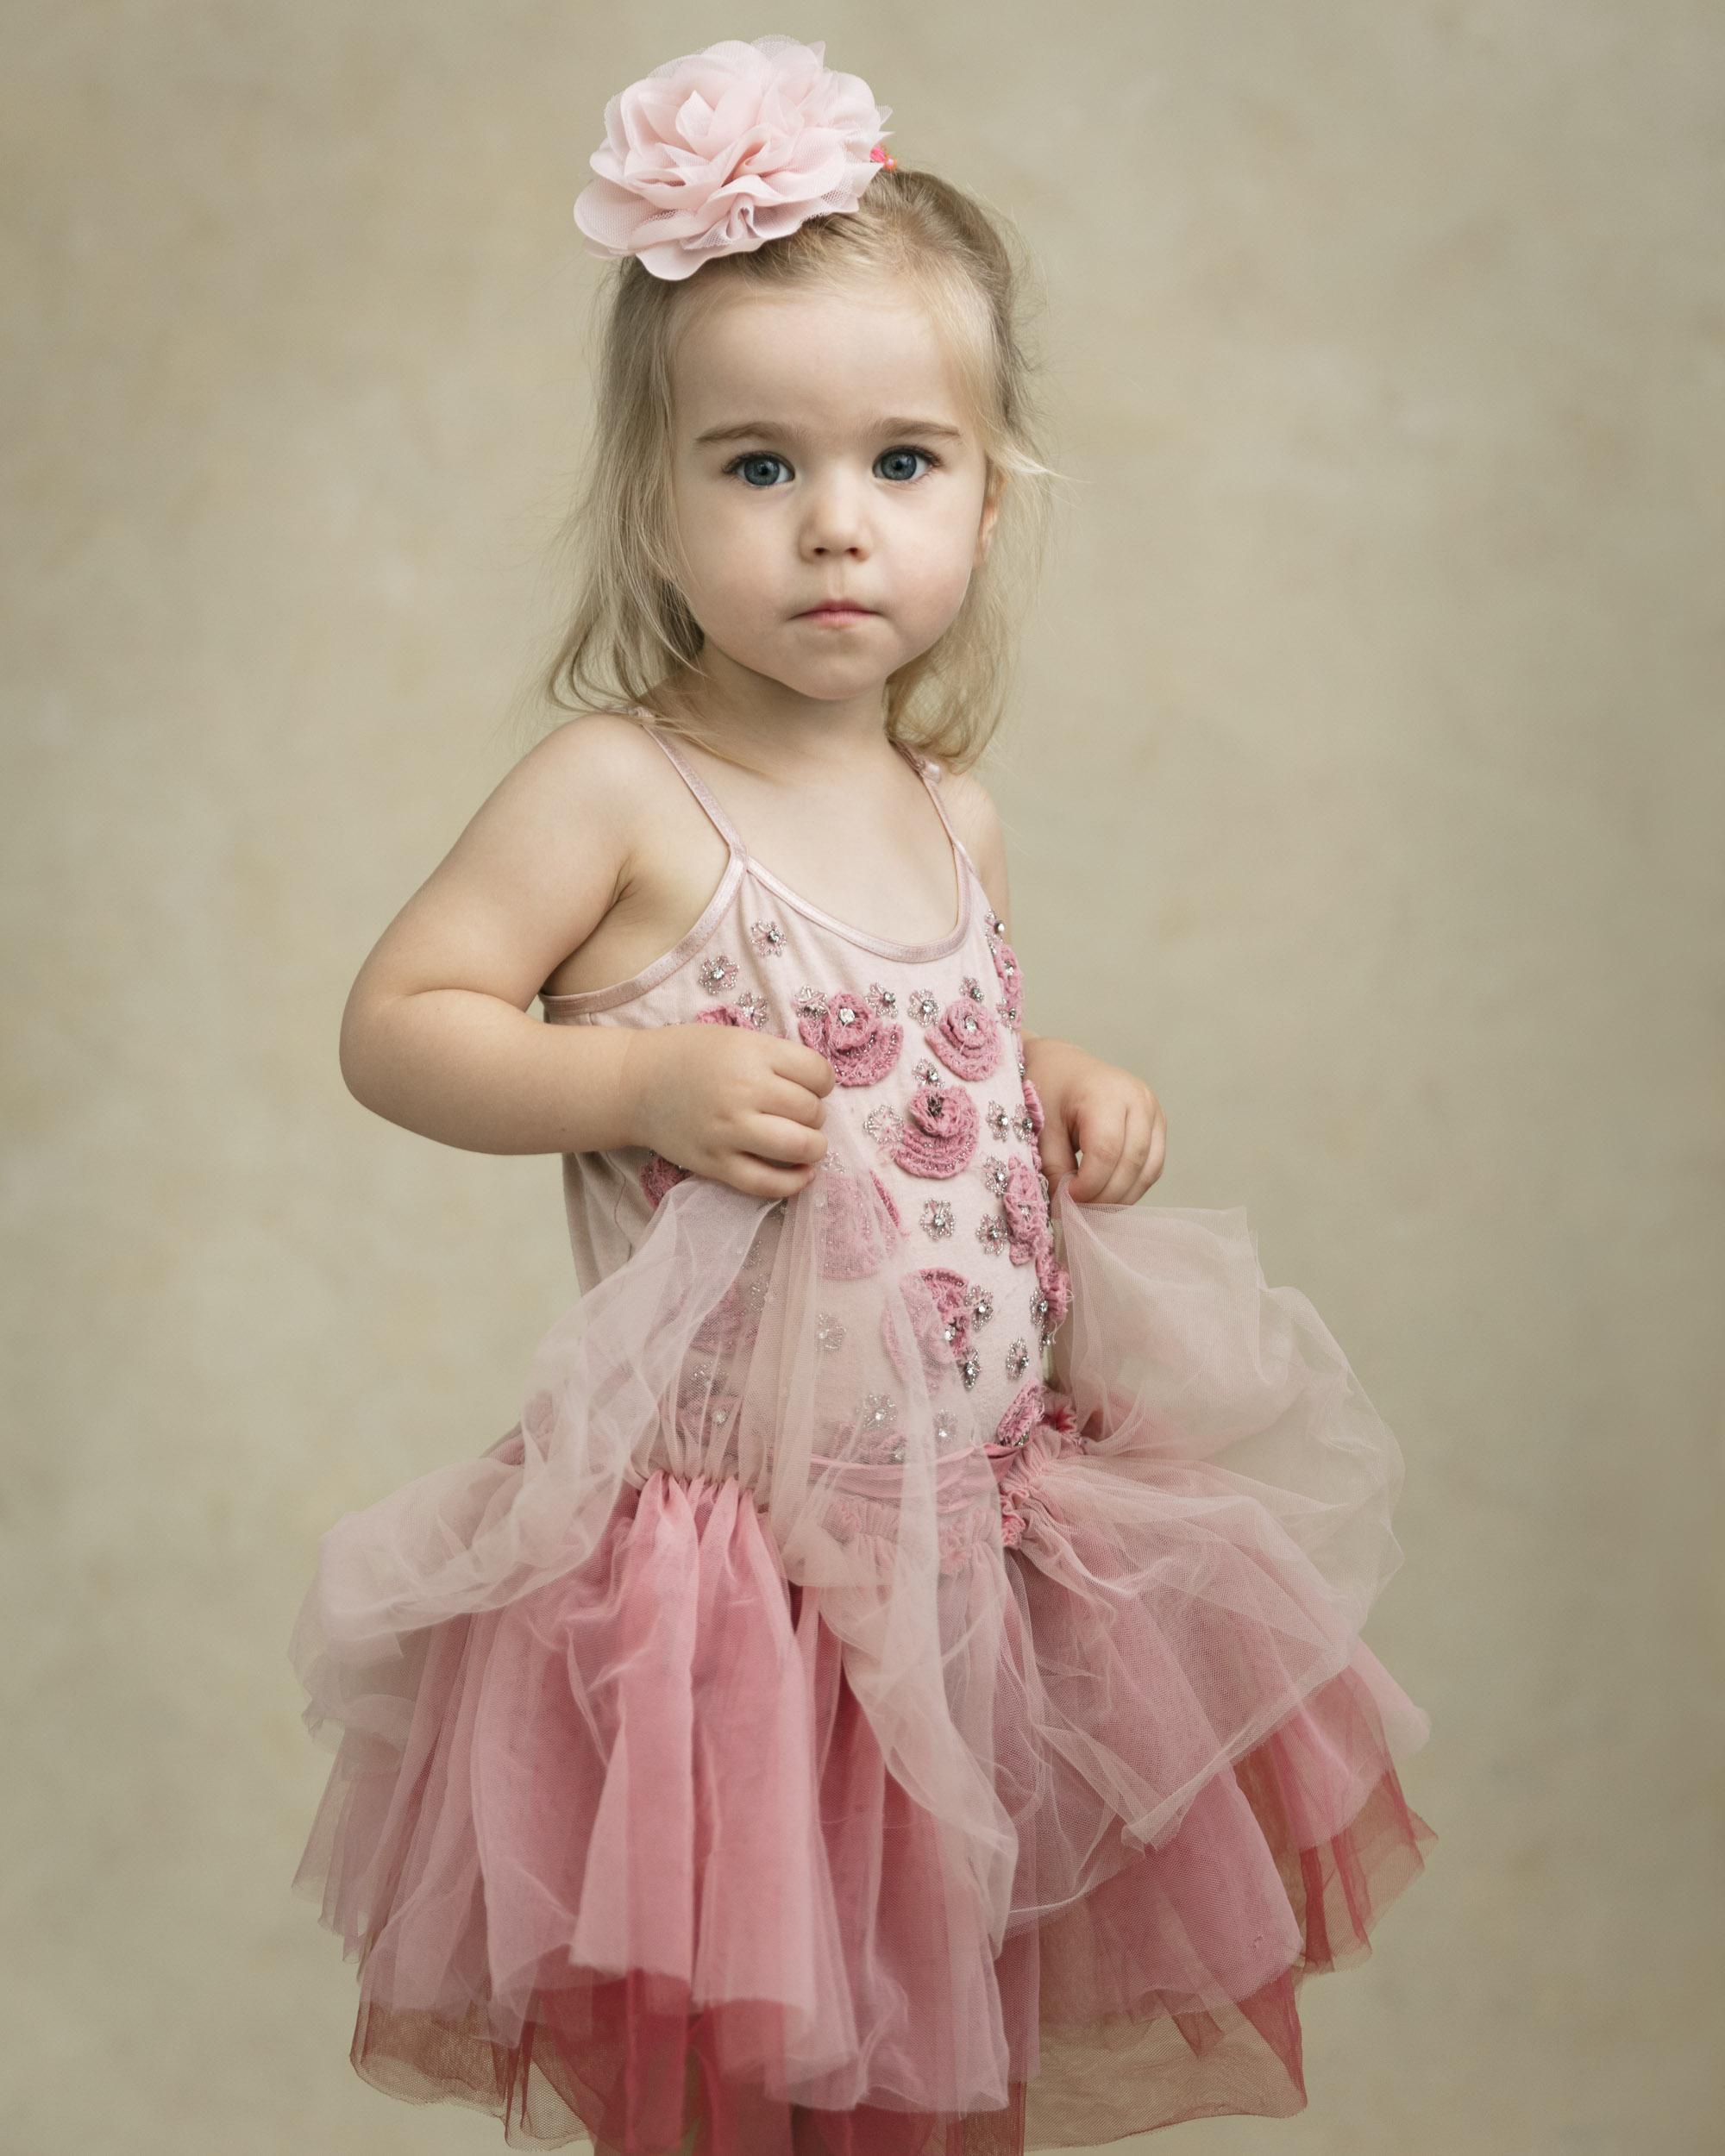 marina-mcdonald-child-portrait-photography-portfolio-canberra-child-pink-dress